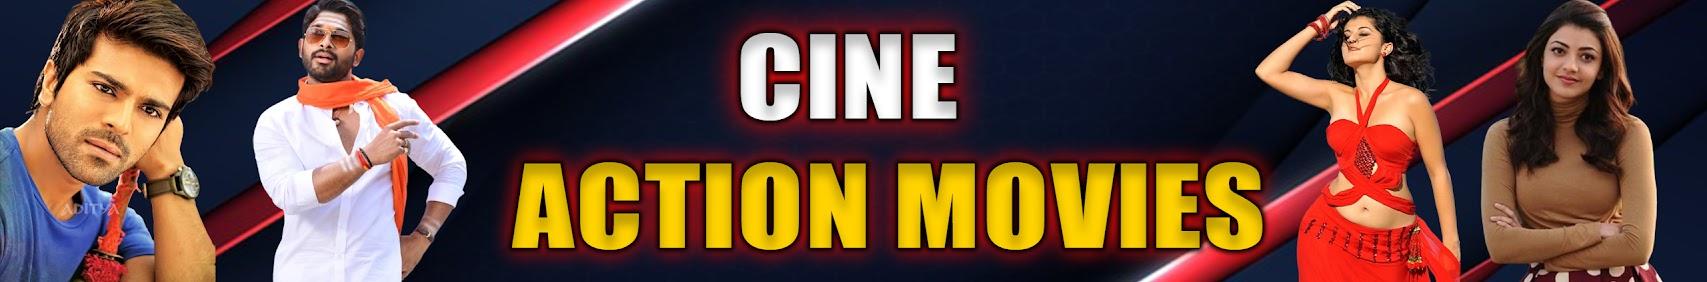 Cine Ua Yeeb Yam Hmoob